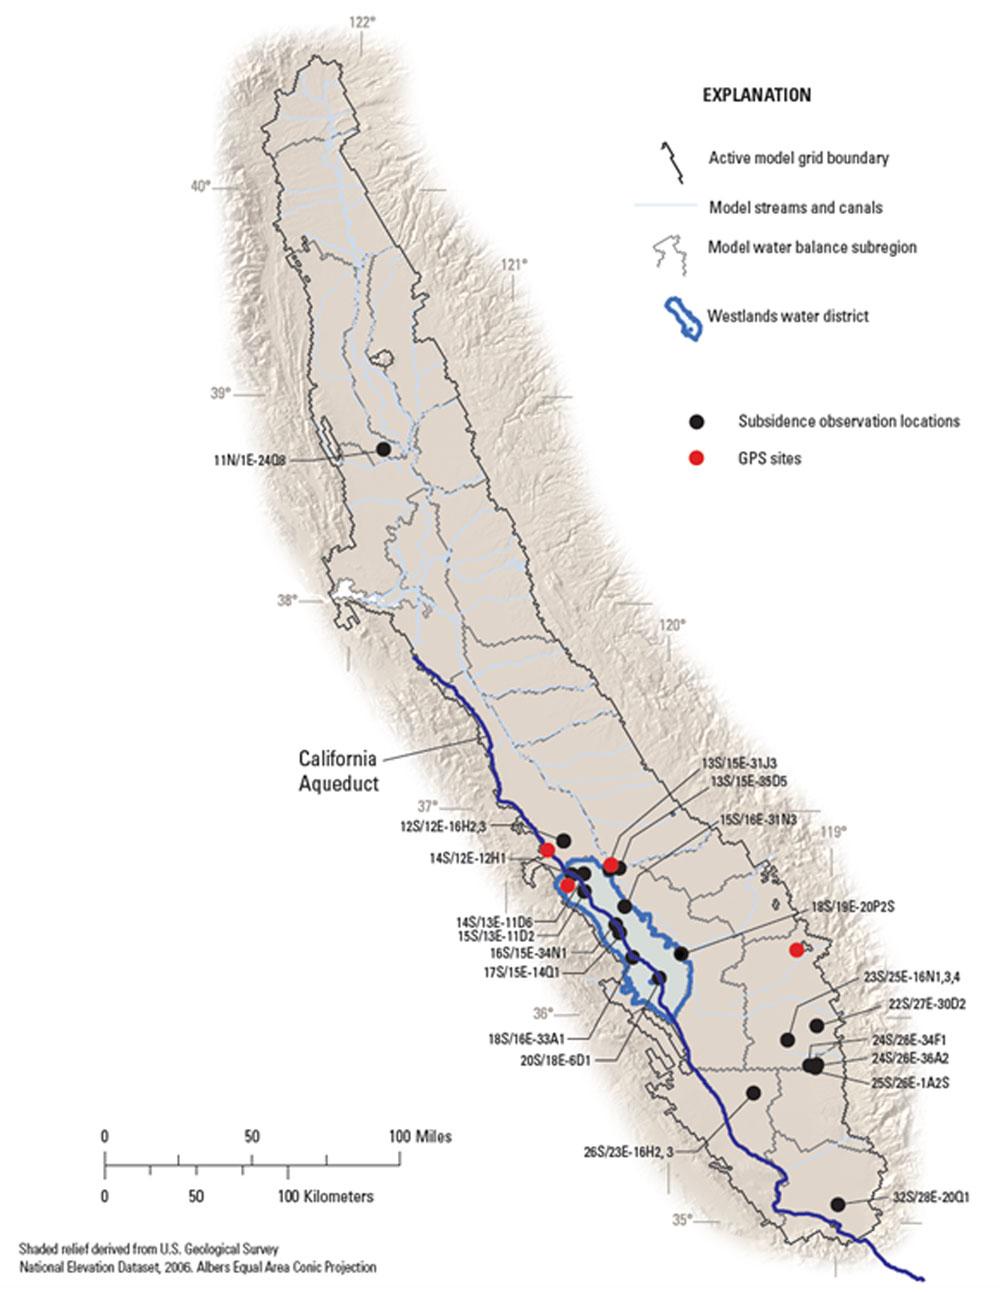 California Aqueduct Subsidence | Usgs California Water Science Center - California Water Map